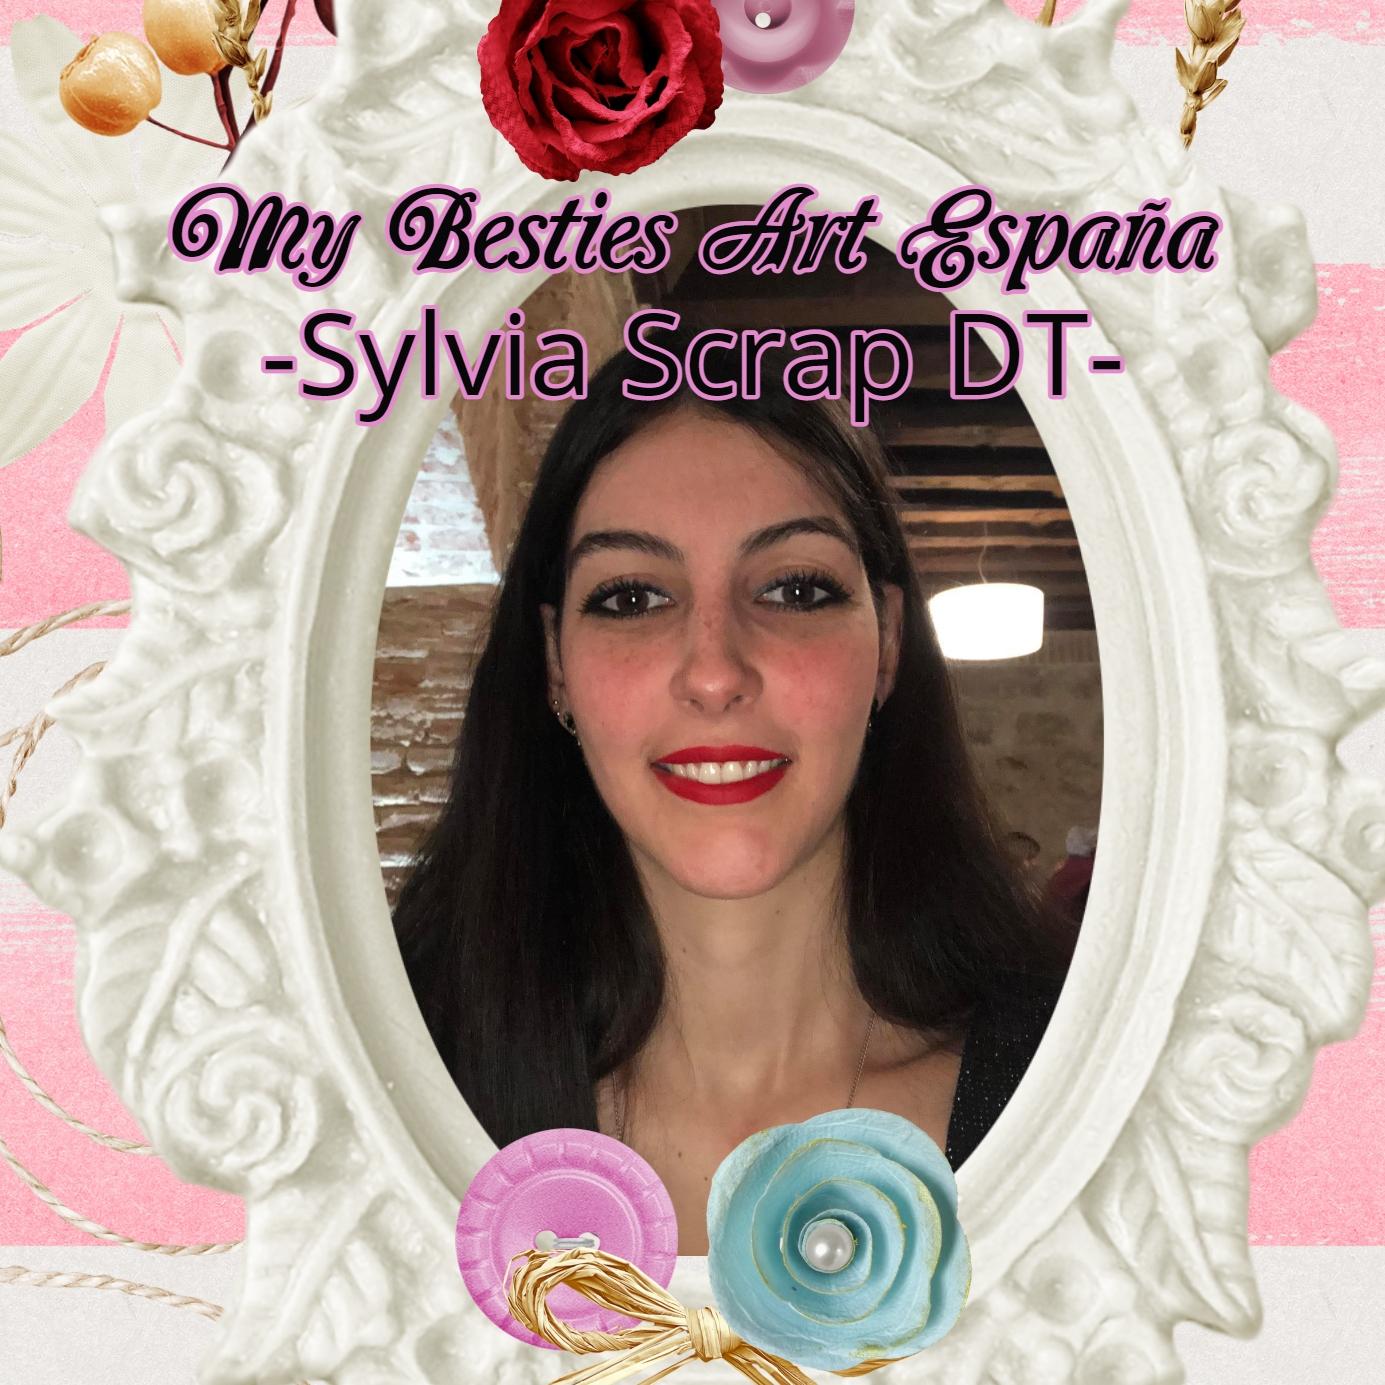 Sylvia Scrap DT